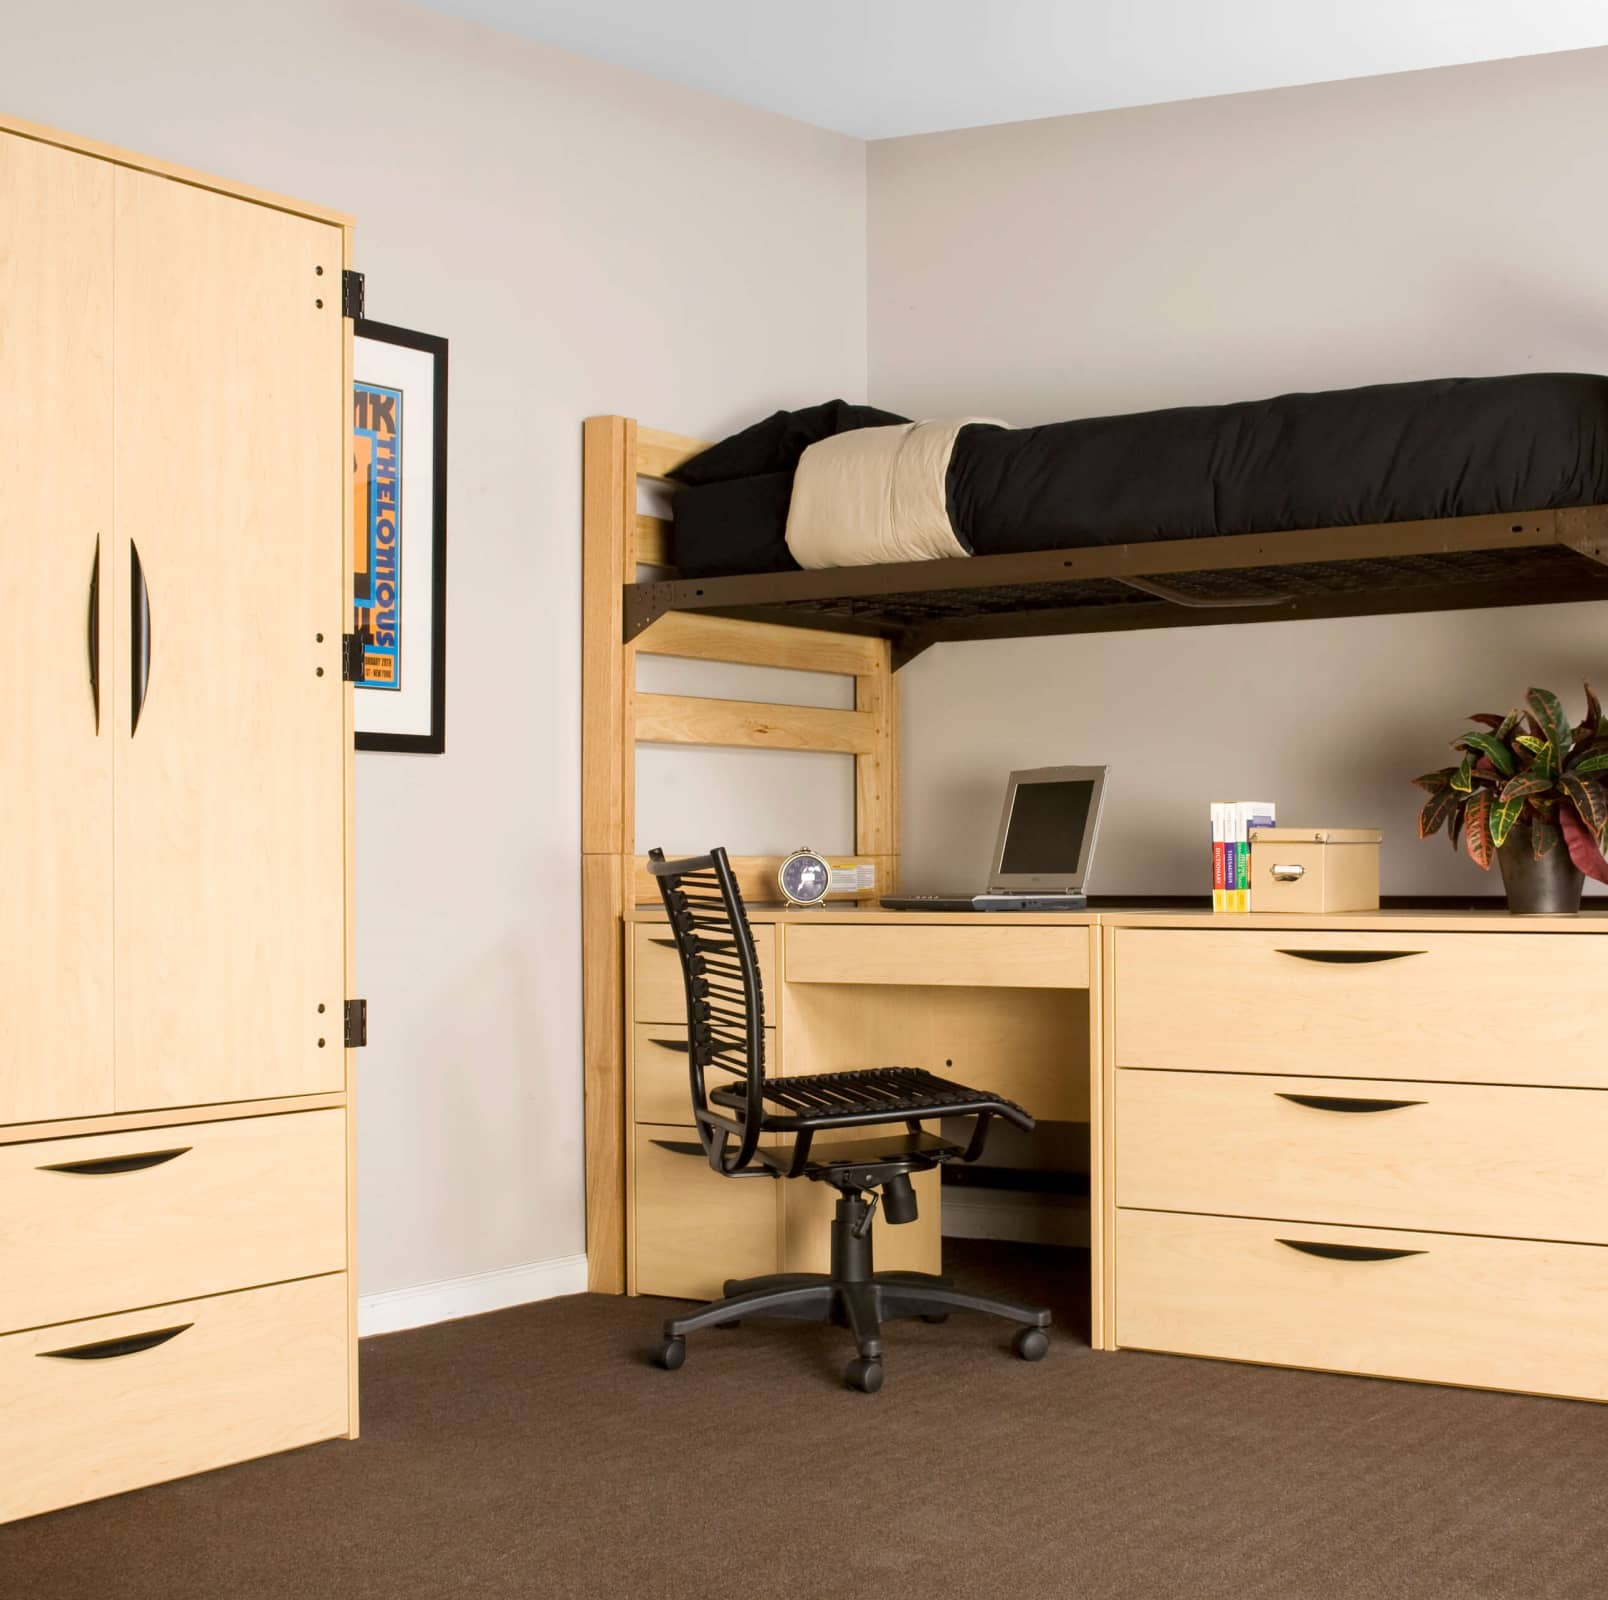 Dormitório Juvenil